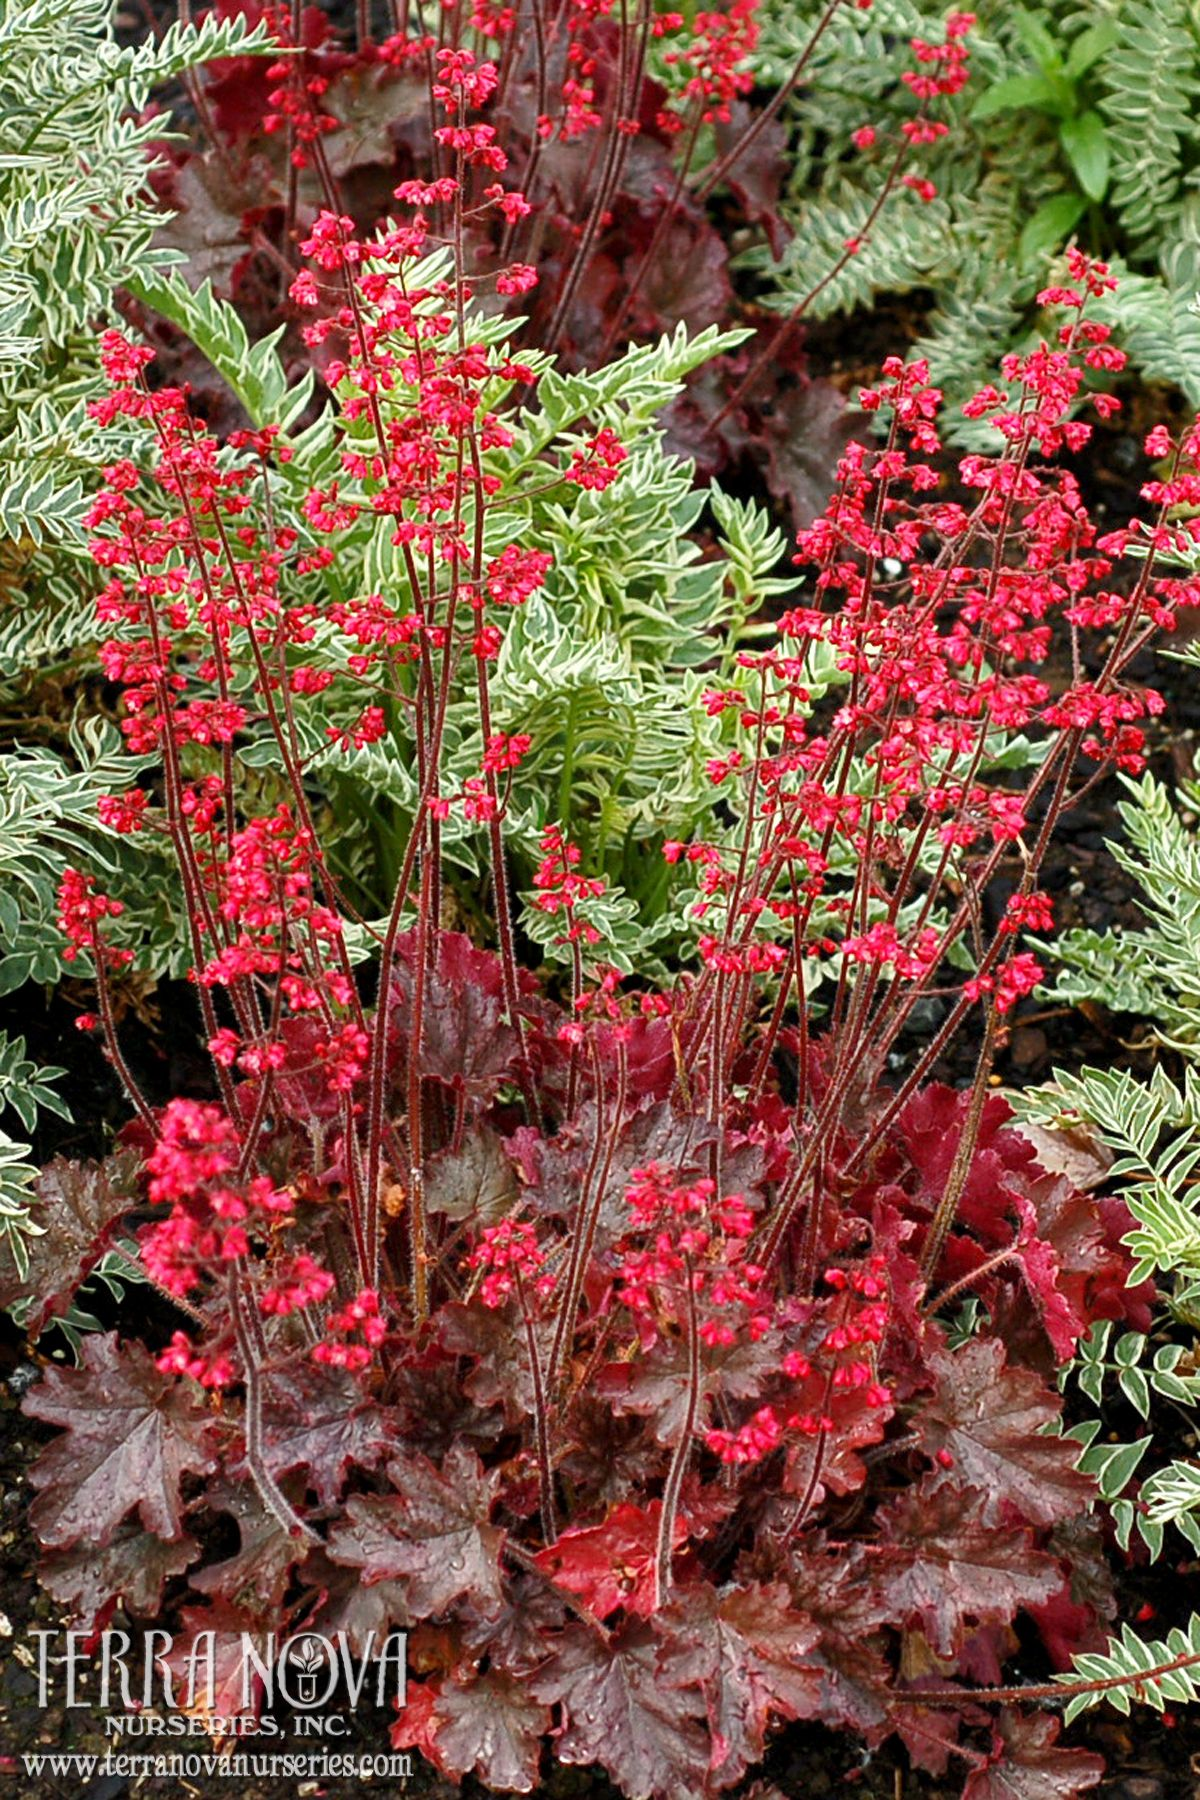 Heuchera Cherries Jubilee Soft Red Flowers On Warm Brown Foliage